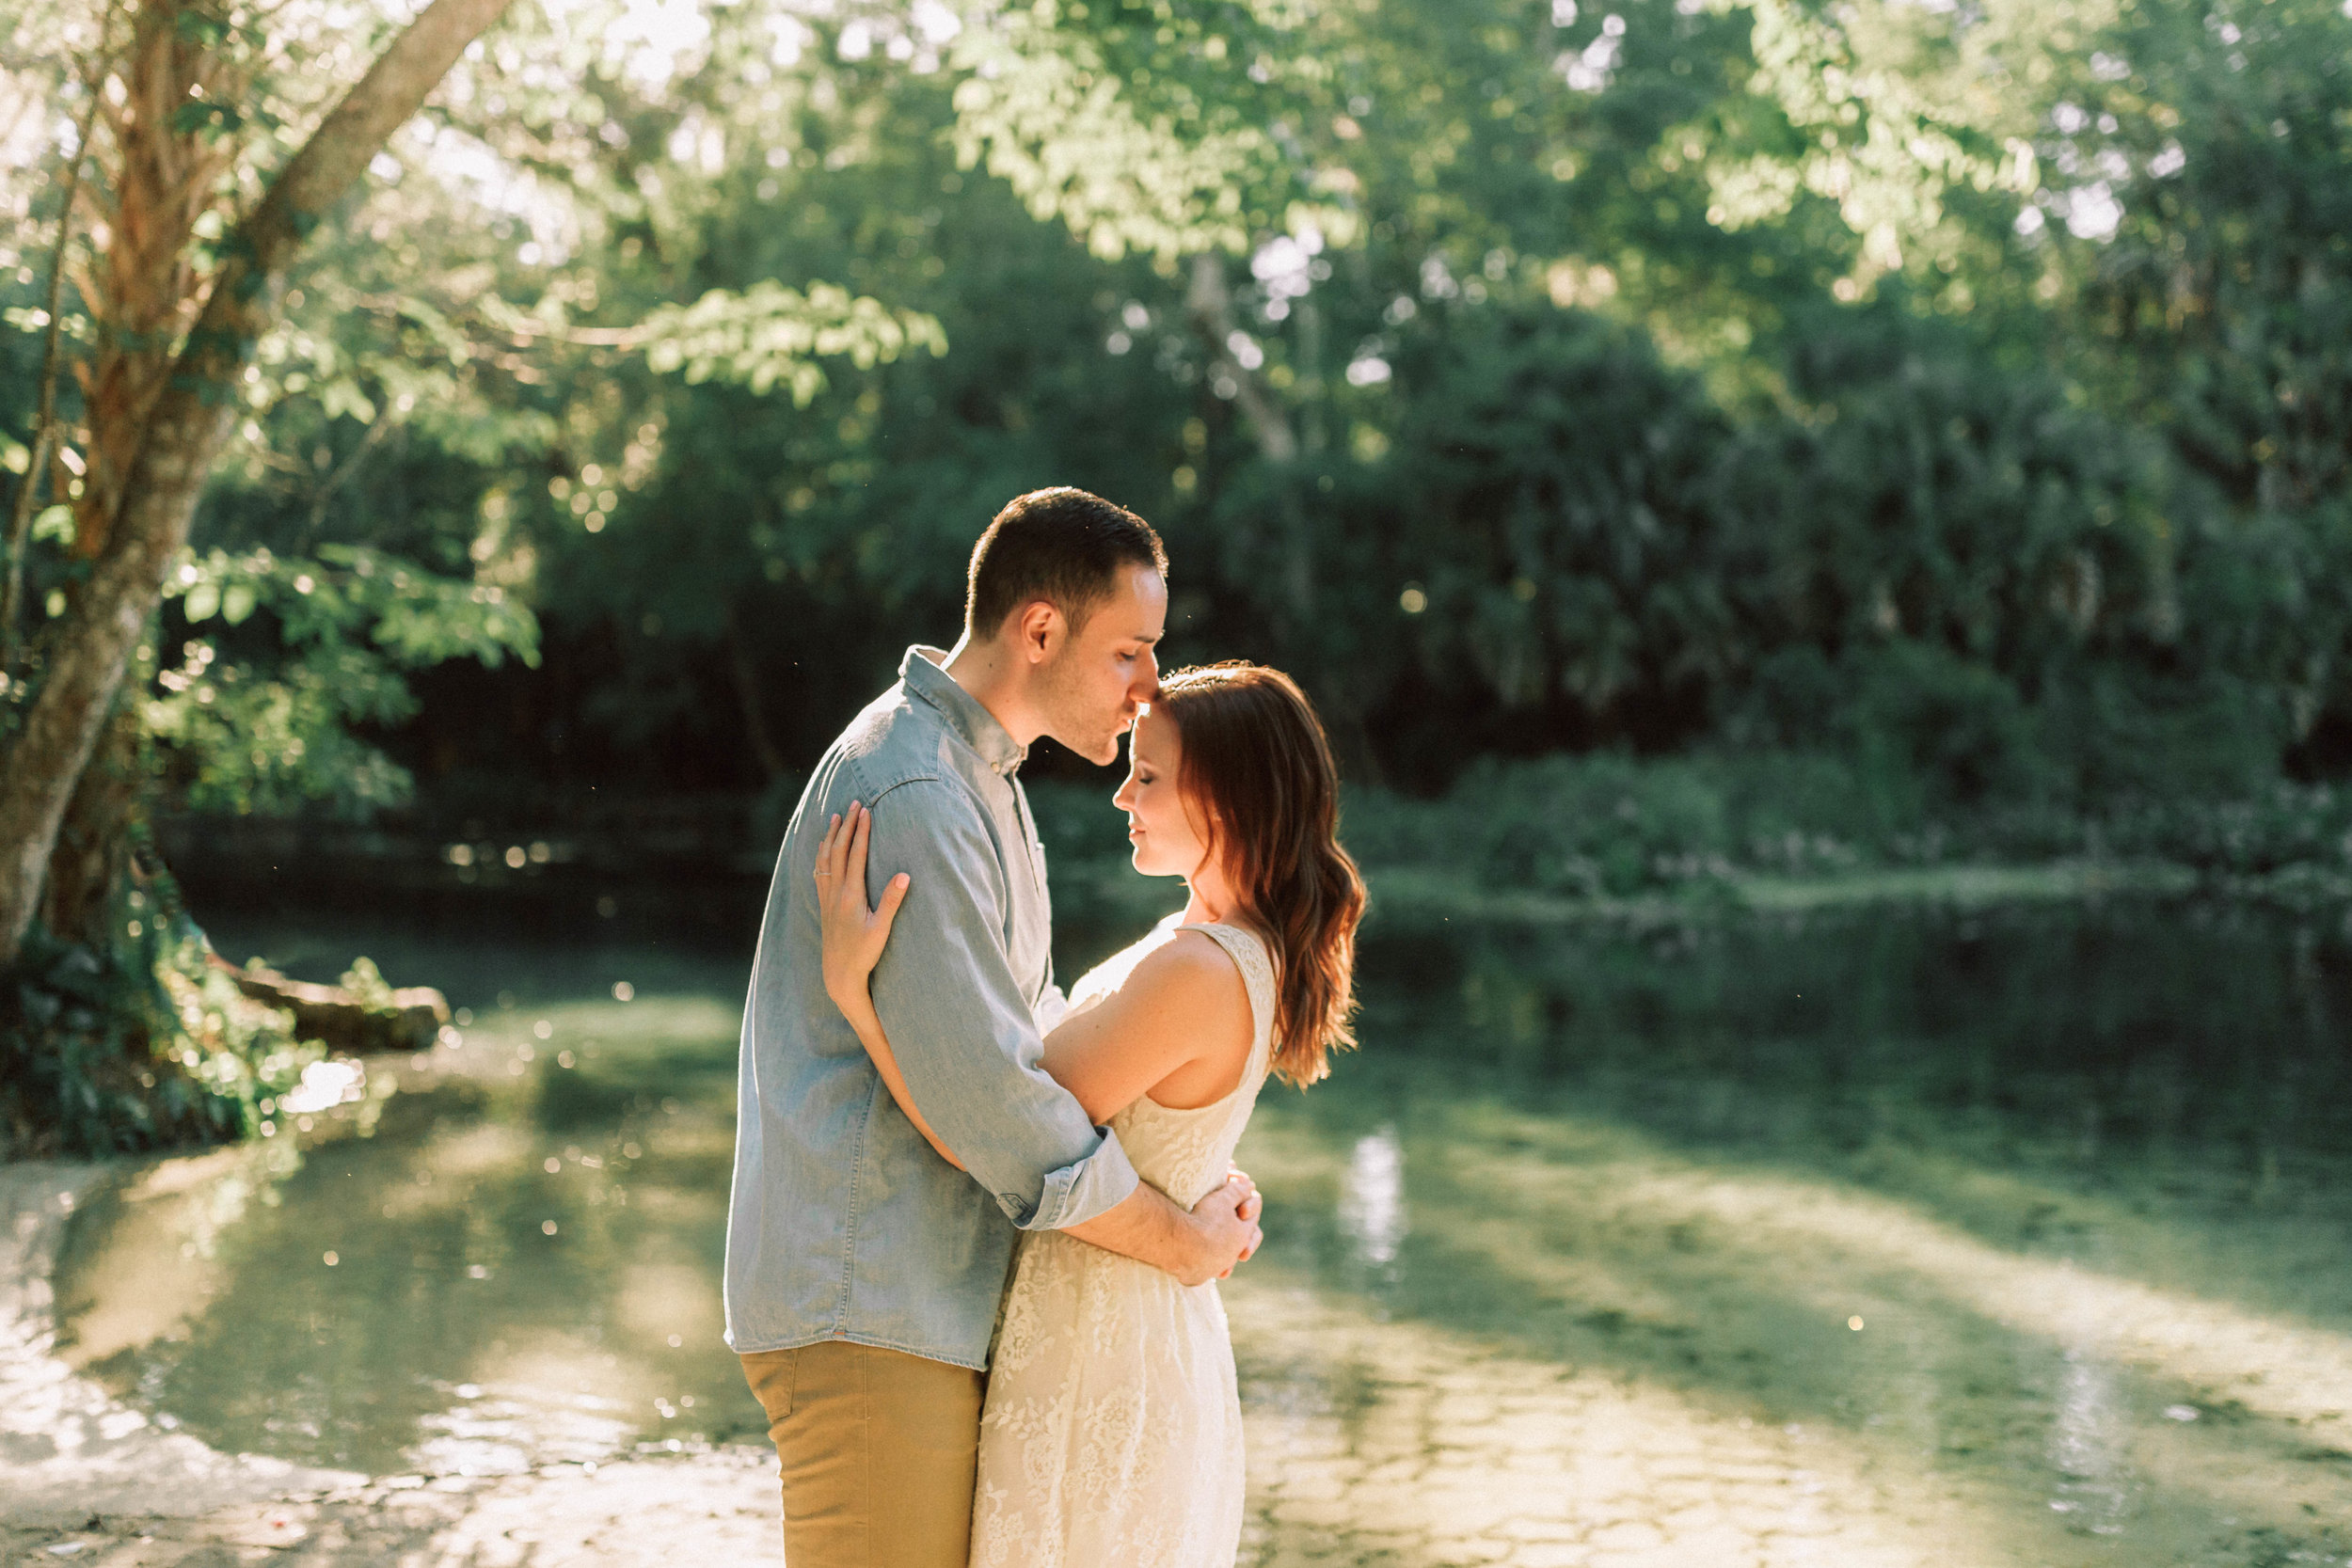 Orlando Engagement session at Wekiva Springs State Park nature-Anthony + Christine 1.jpg